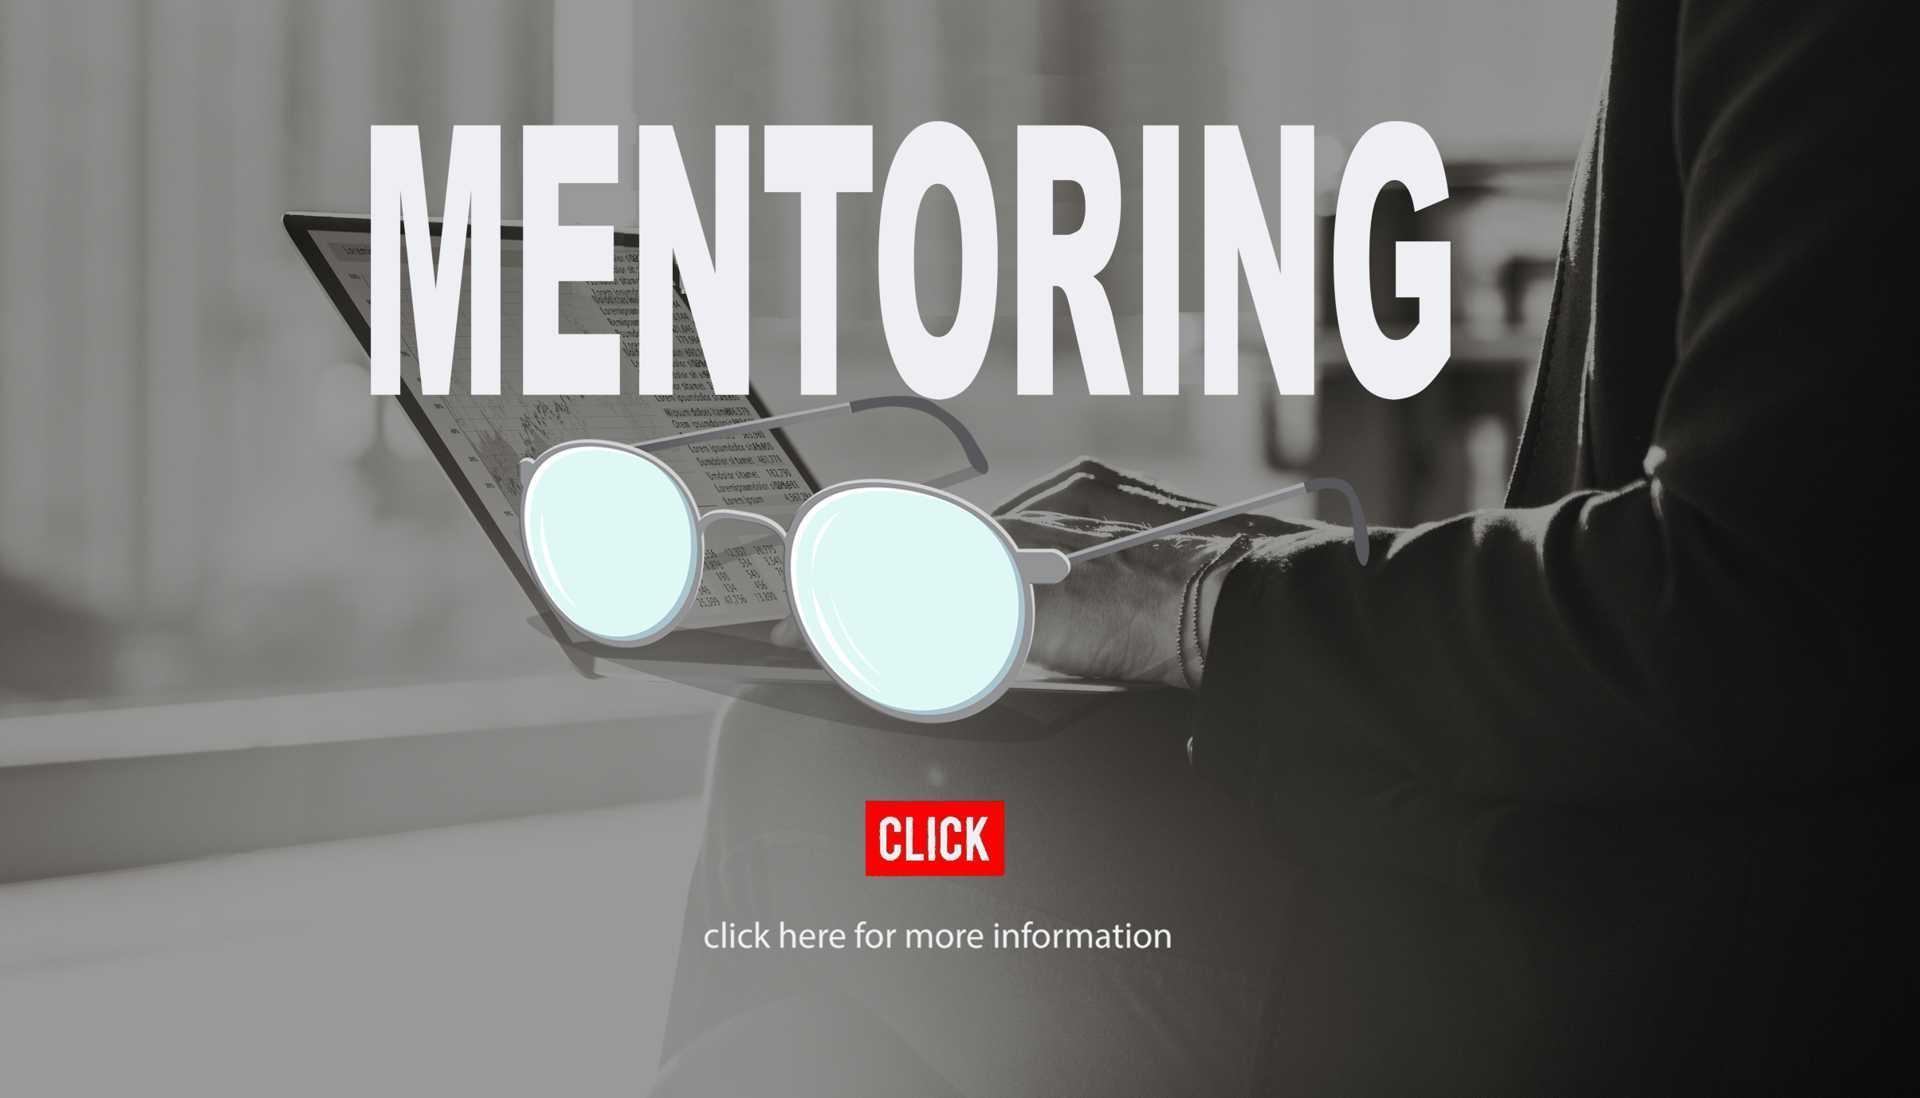 mentoring-onboarding.jpg